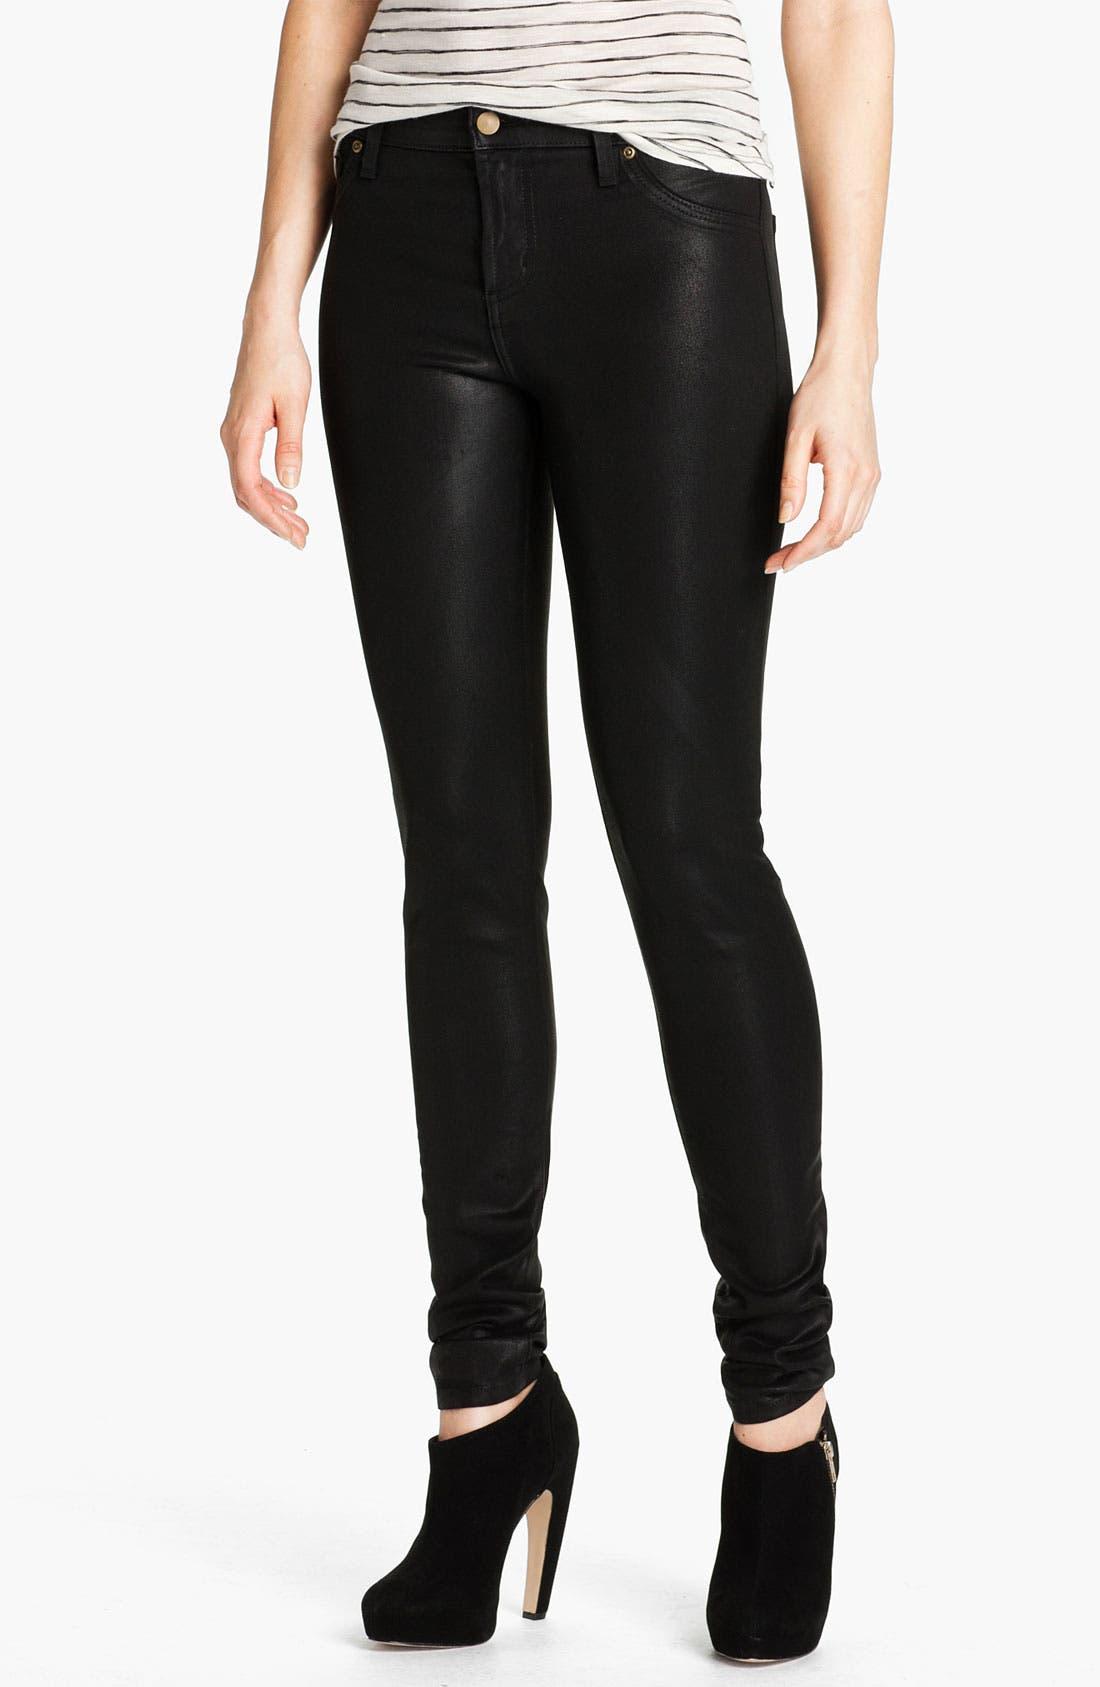 Sarah & George Coated Denim Jeans,                             Main thumbnail 1, color,                             Black